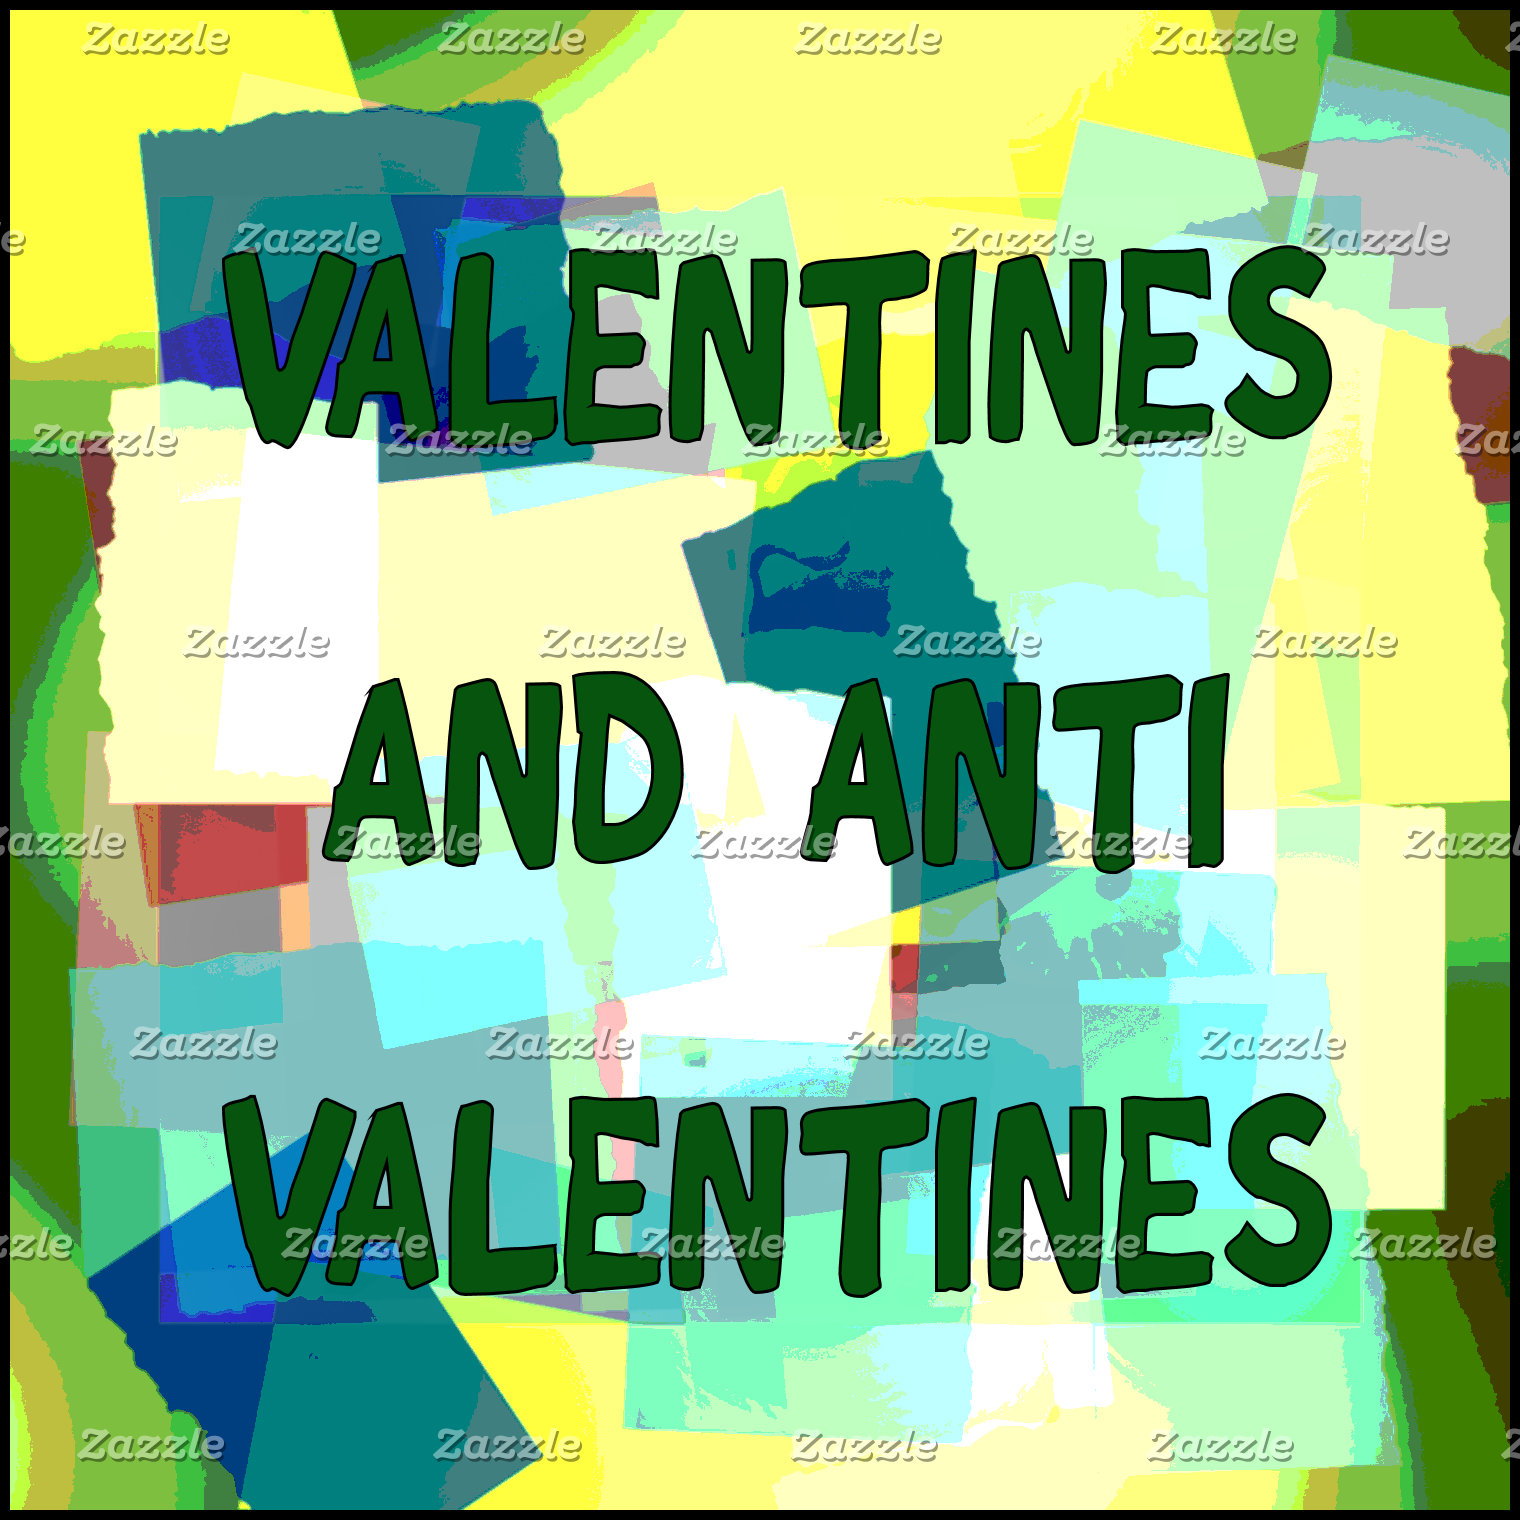 VALENTINE'S AND ANTI-VALENTINES